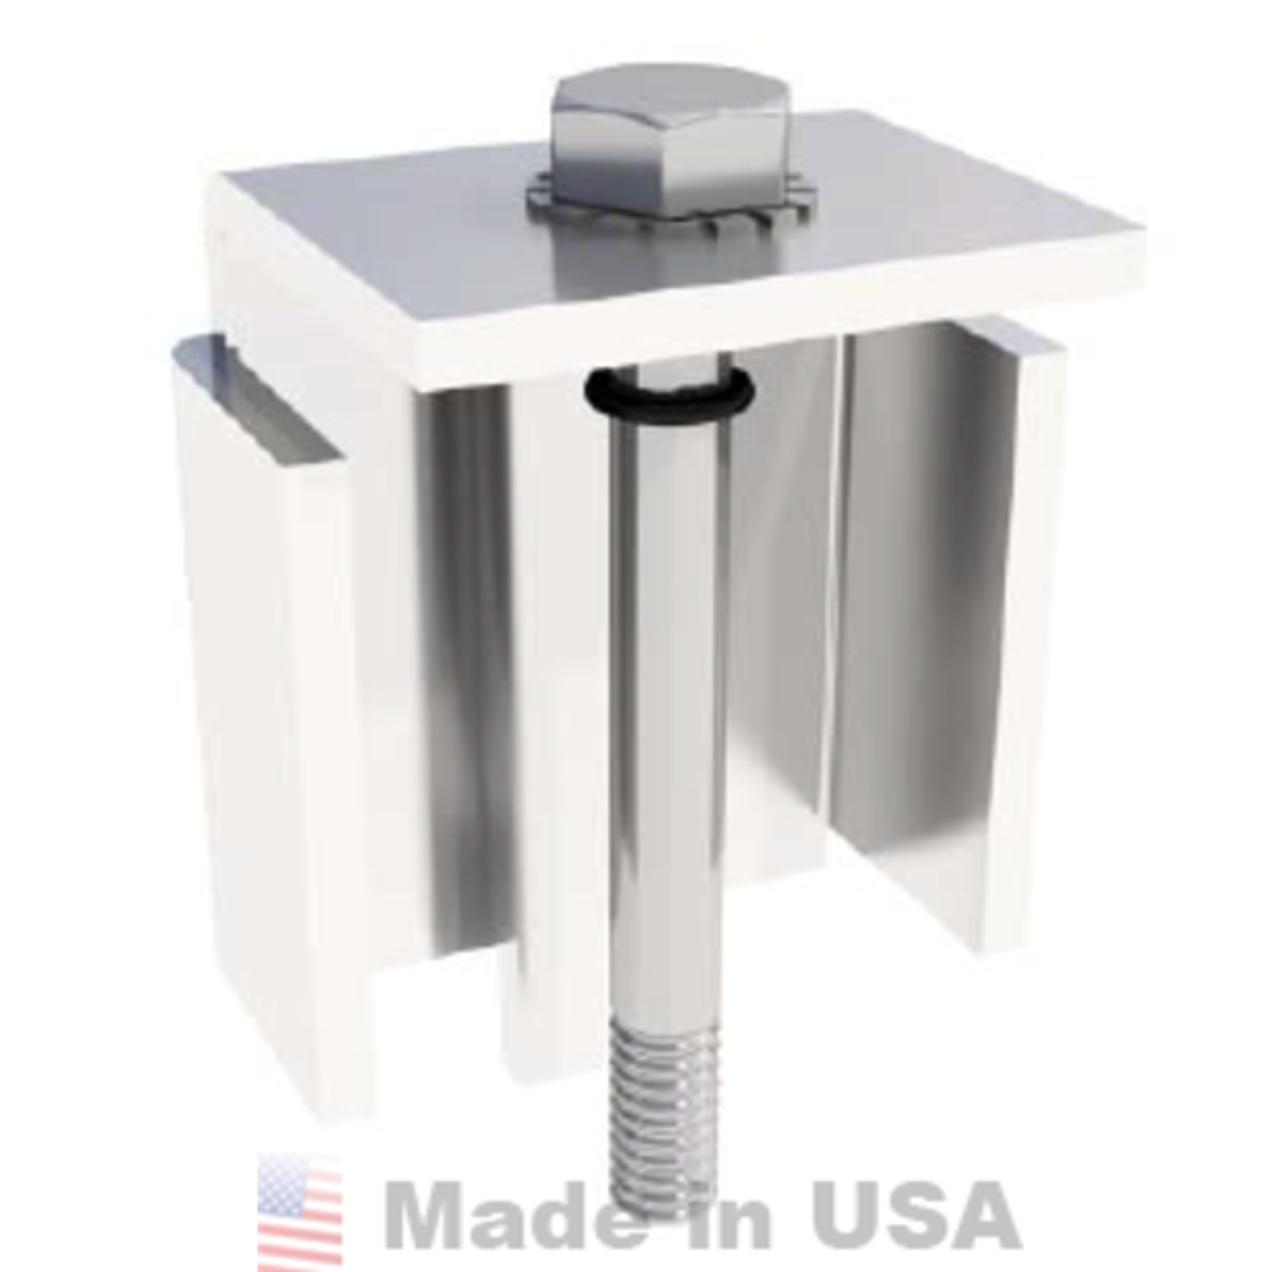 IronRidge BRM Ballast Module Clamp (Fits 31.5mm - 32.4mm)